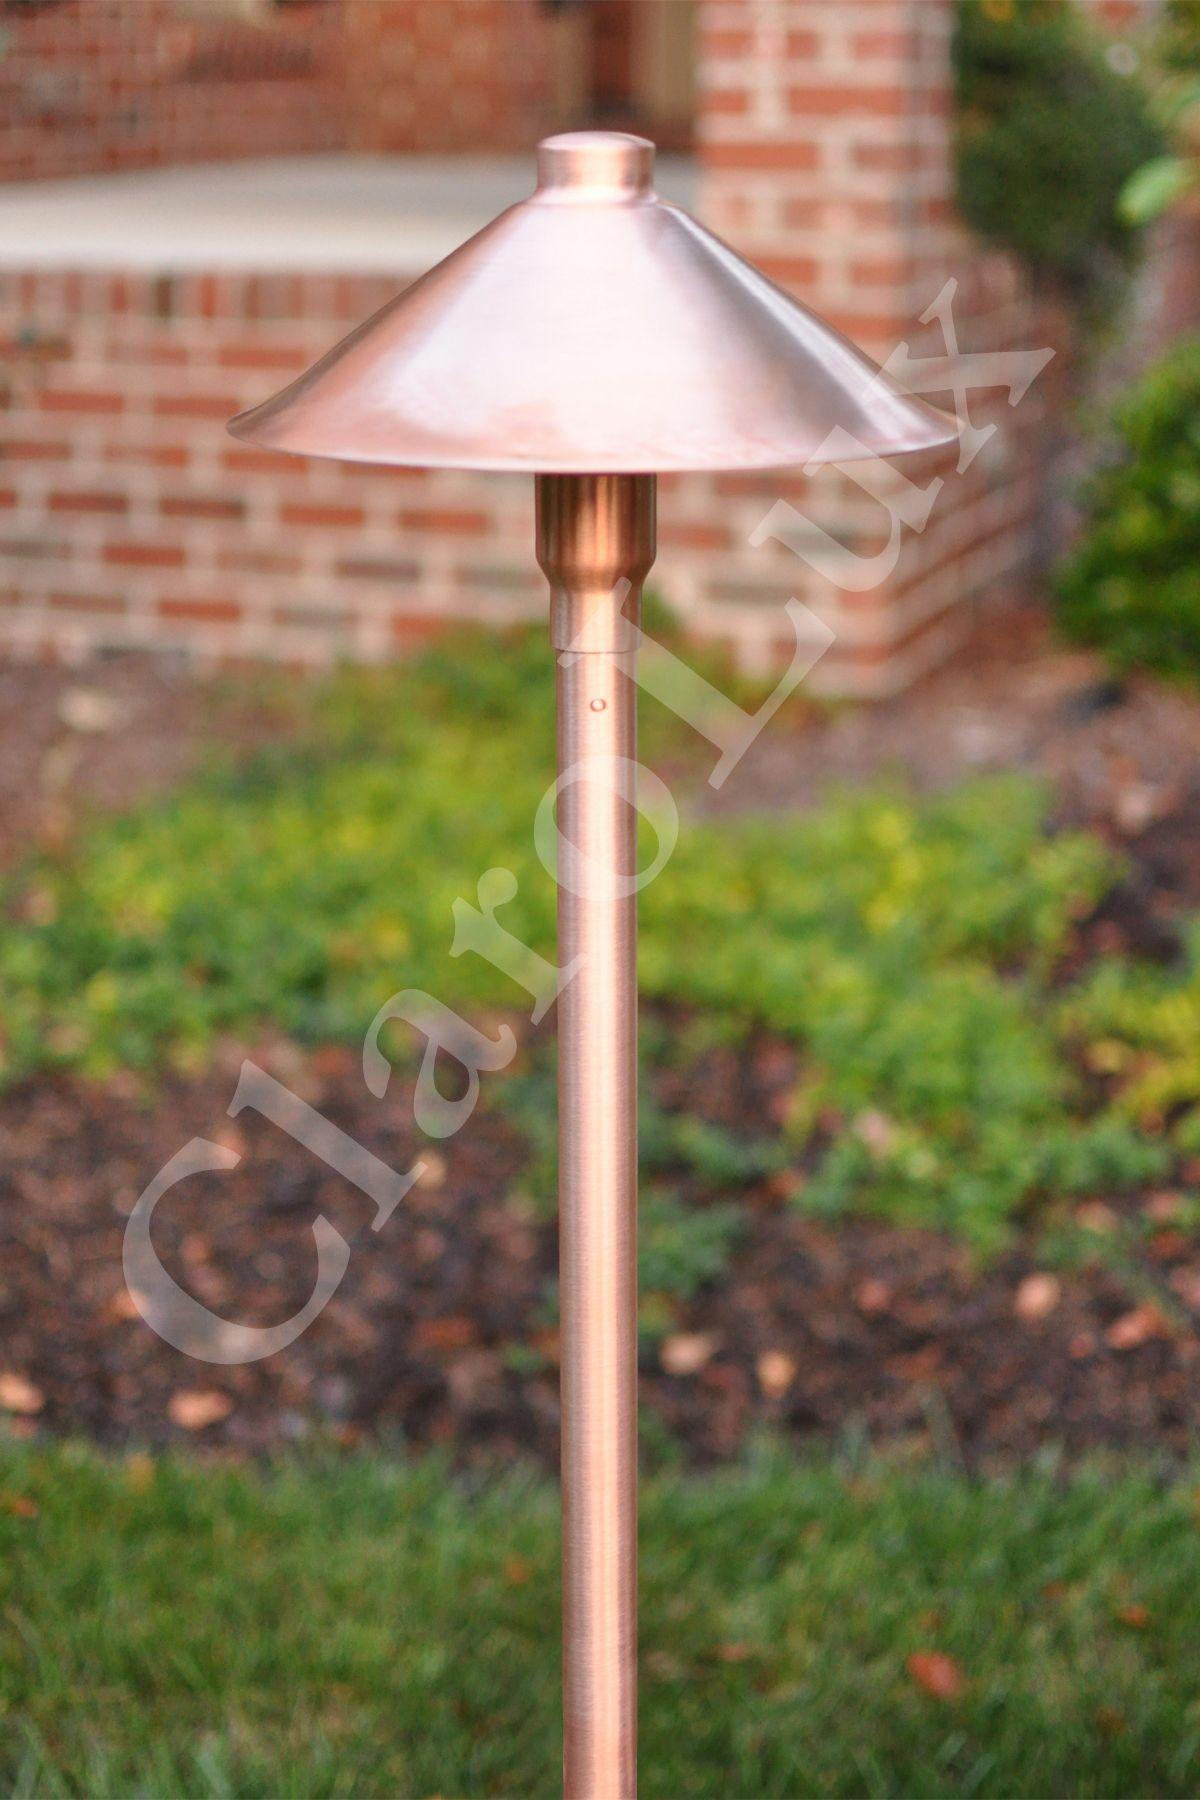 Clarolux Cl Al7 I Copper Led Path Light Outdoor Light Fixtures